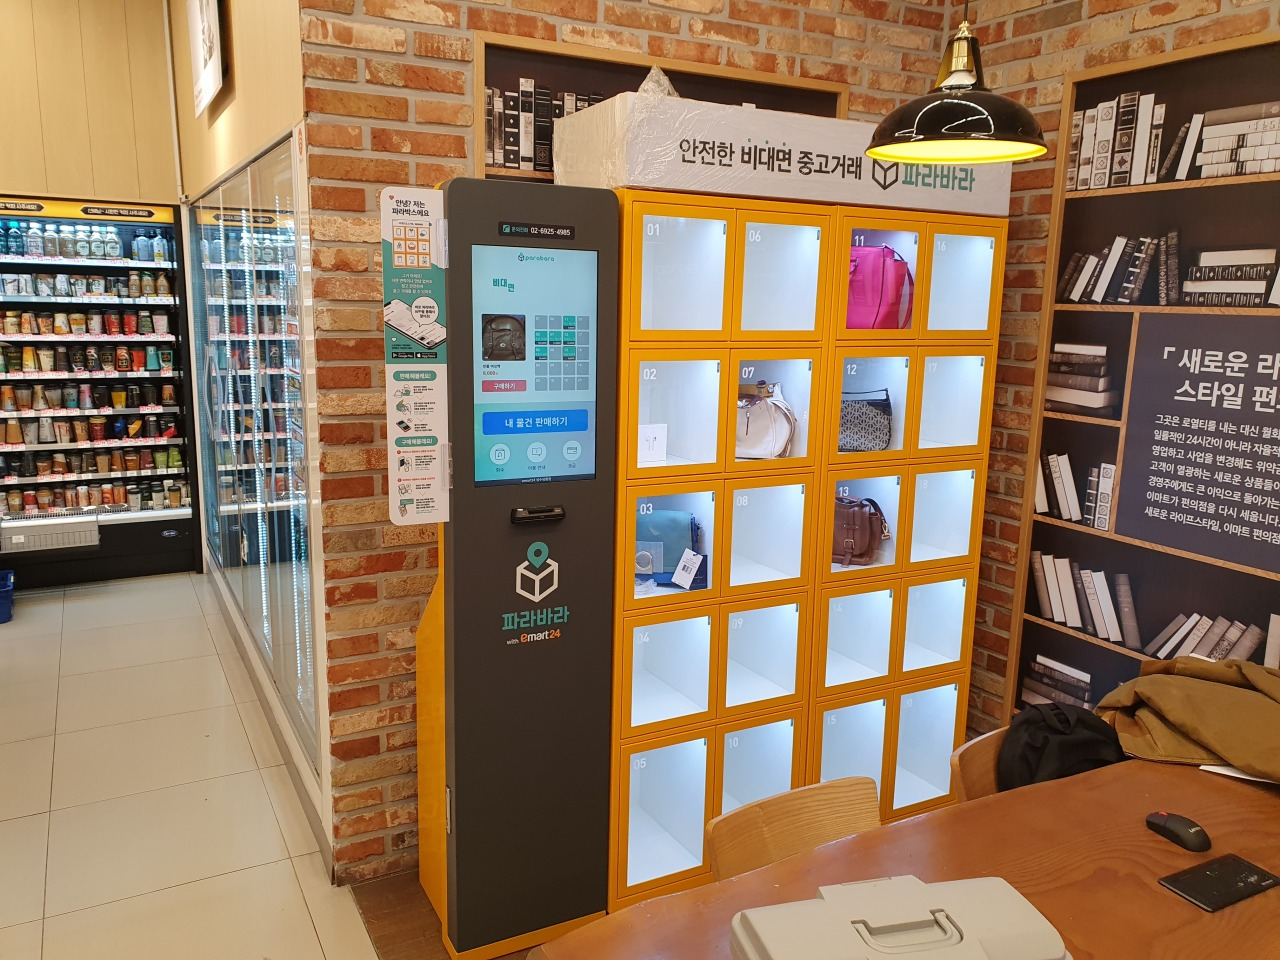 A Parabara vending machine for secondhand goods trading at a supermarket (Parabara)